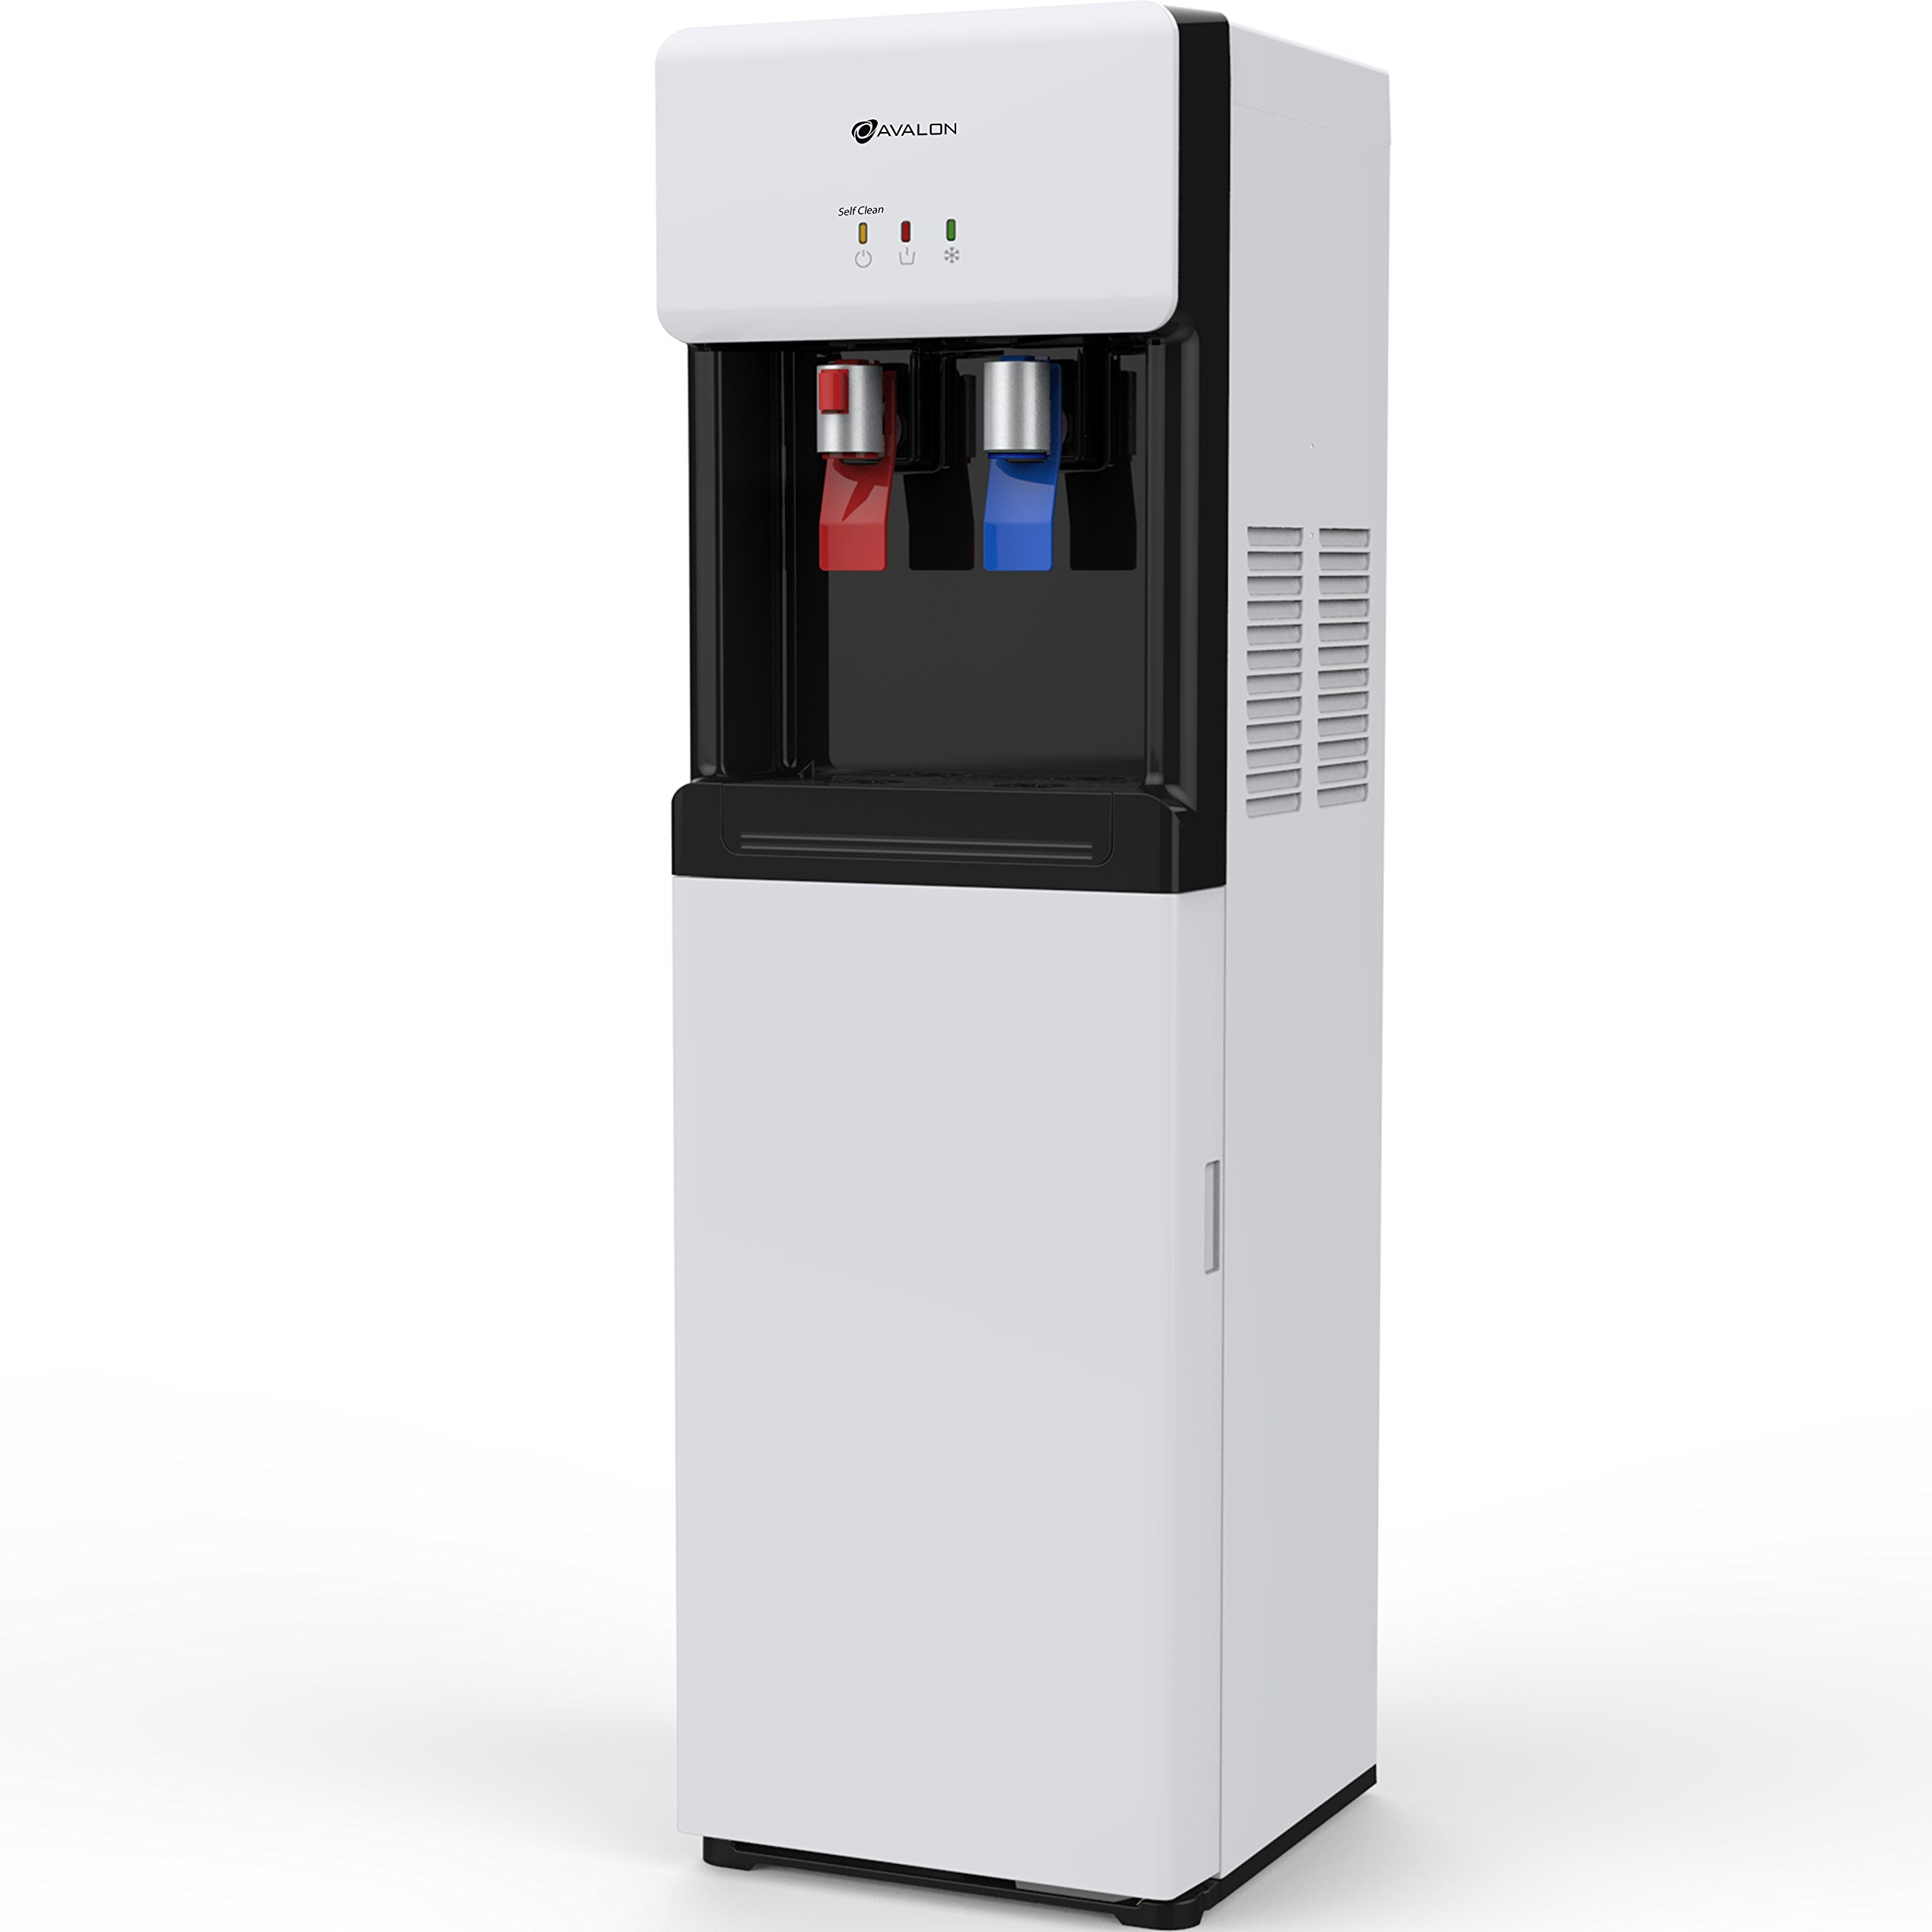 Avalon A6BLWTRCLRWHT Self Cleaning Bottom Loading Water Cooler Dispenser, White